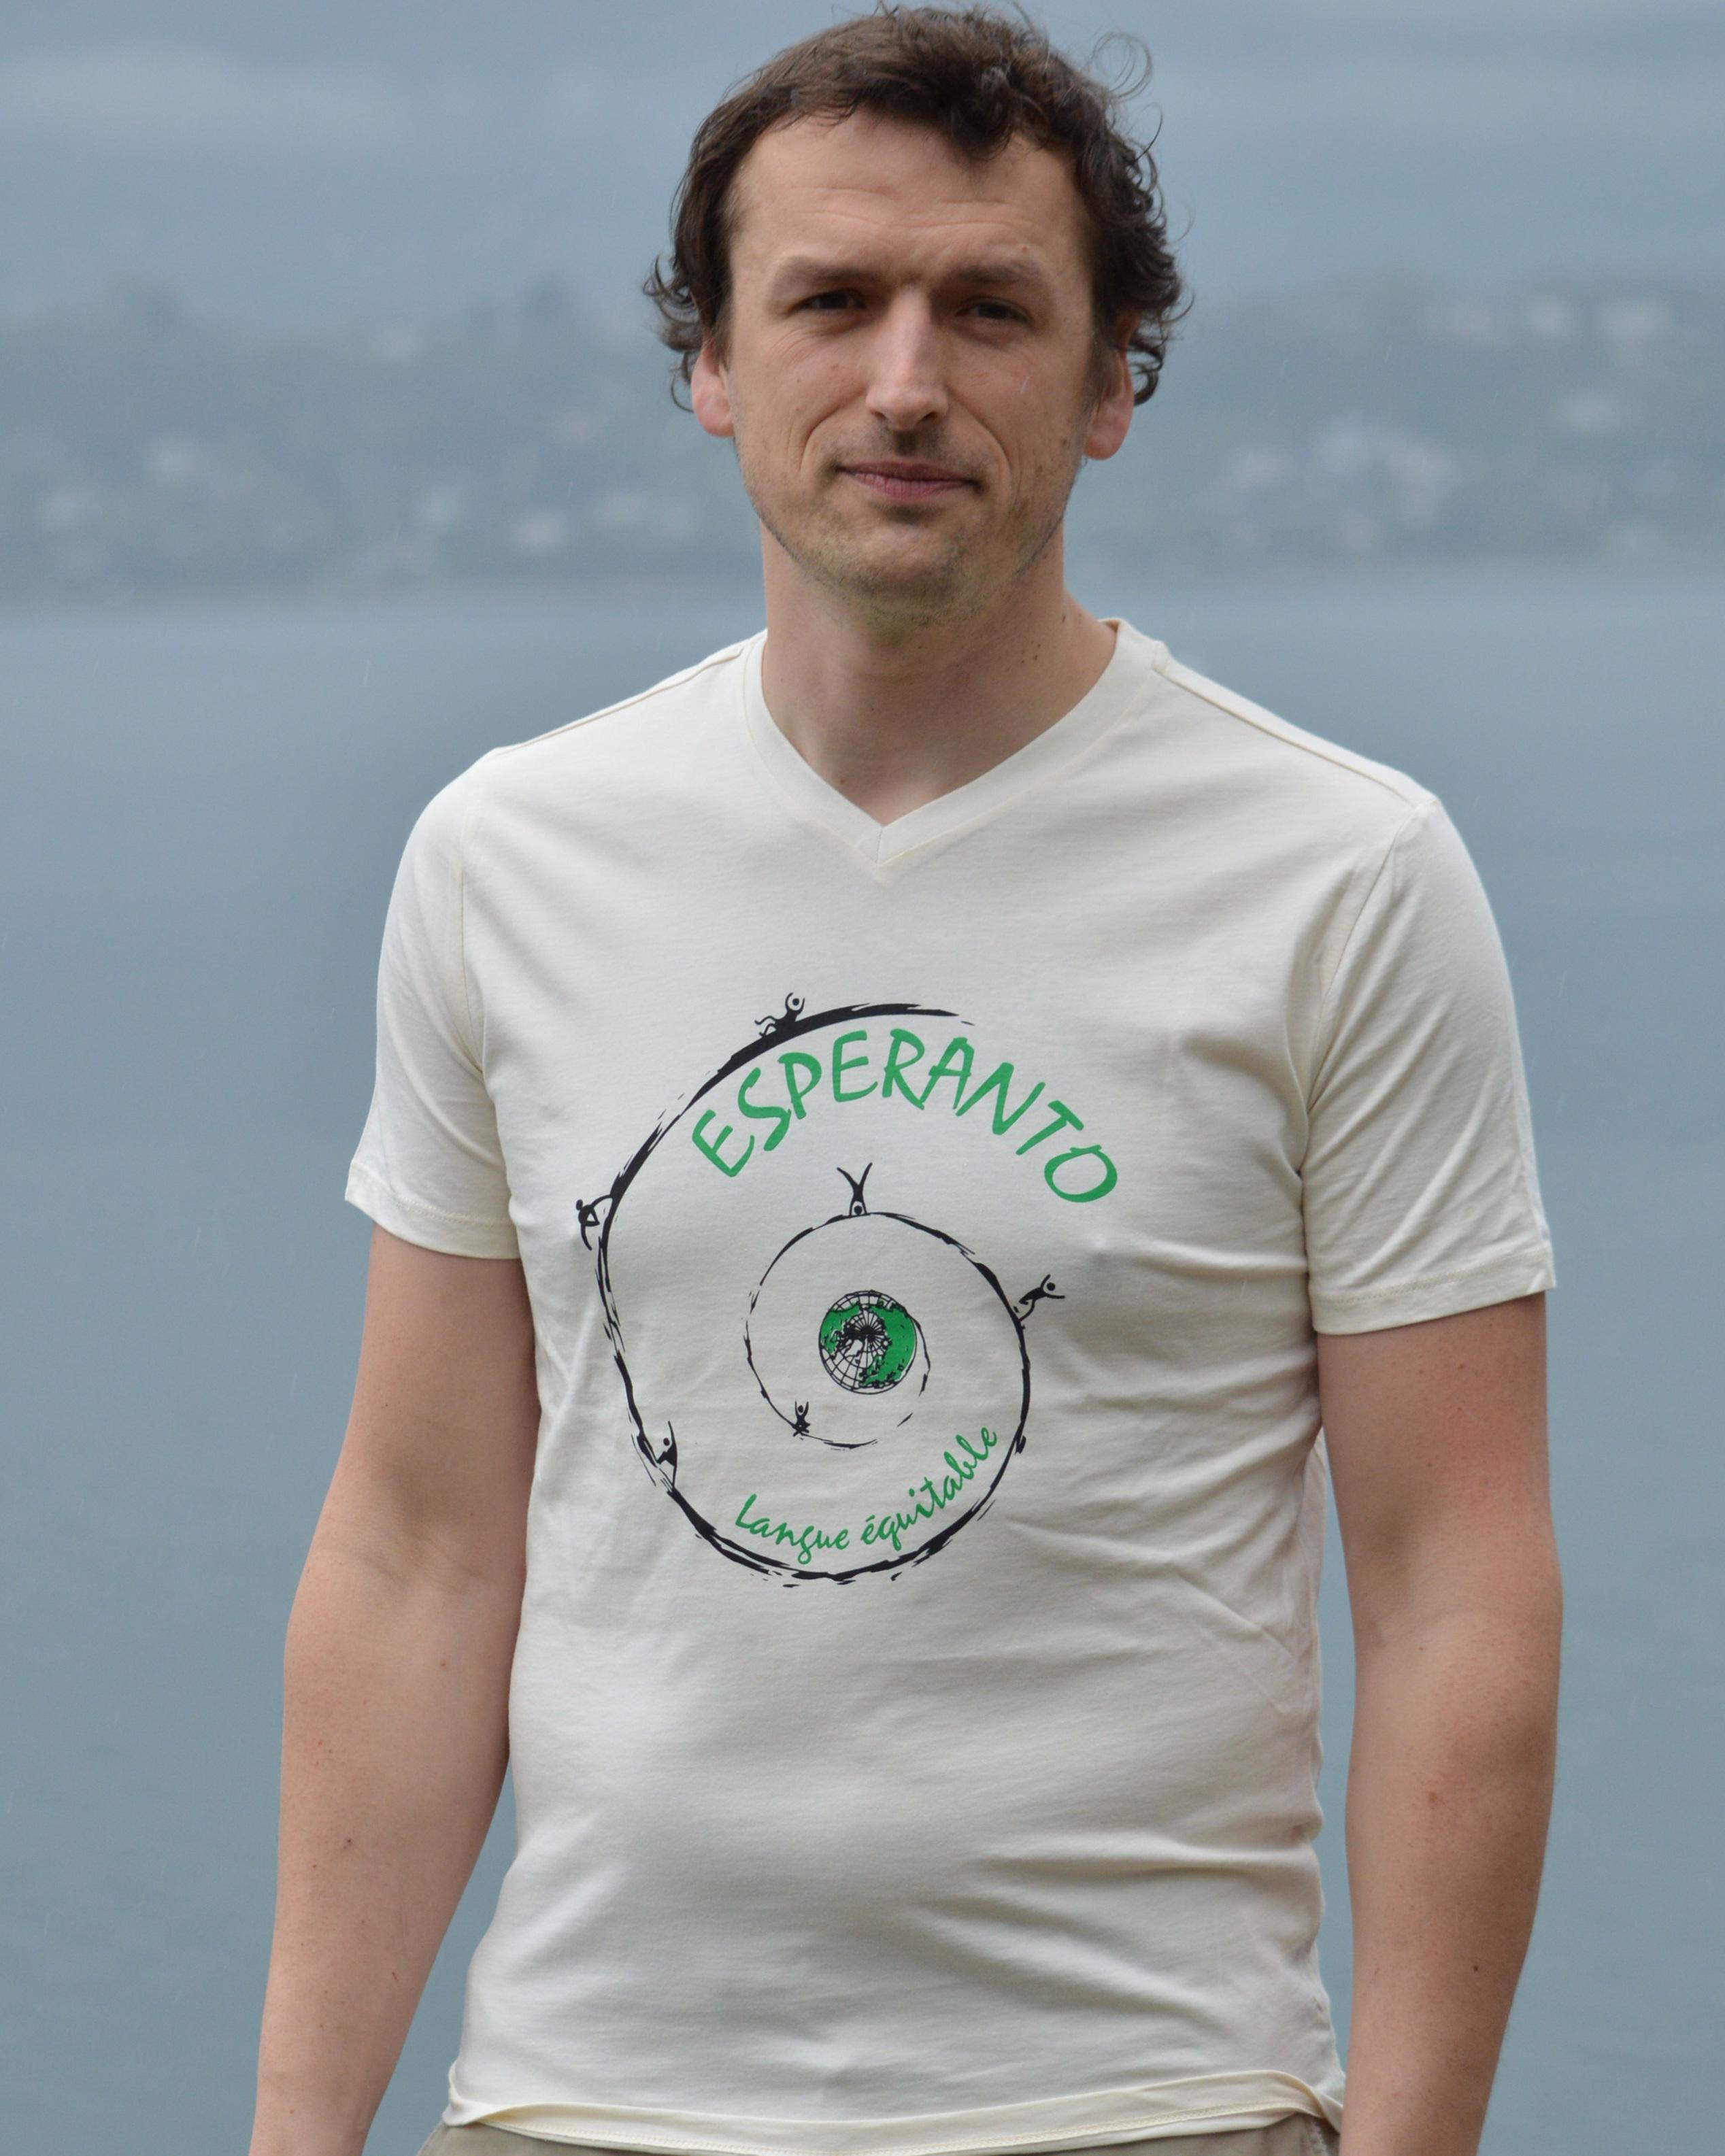 T-shirt esperanto langue équitable